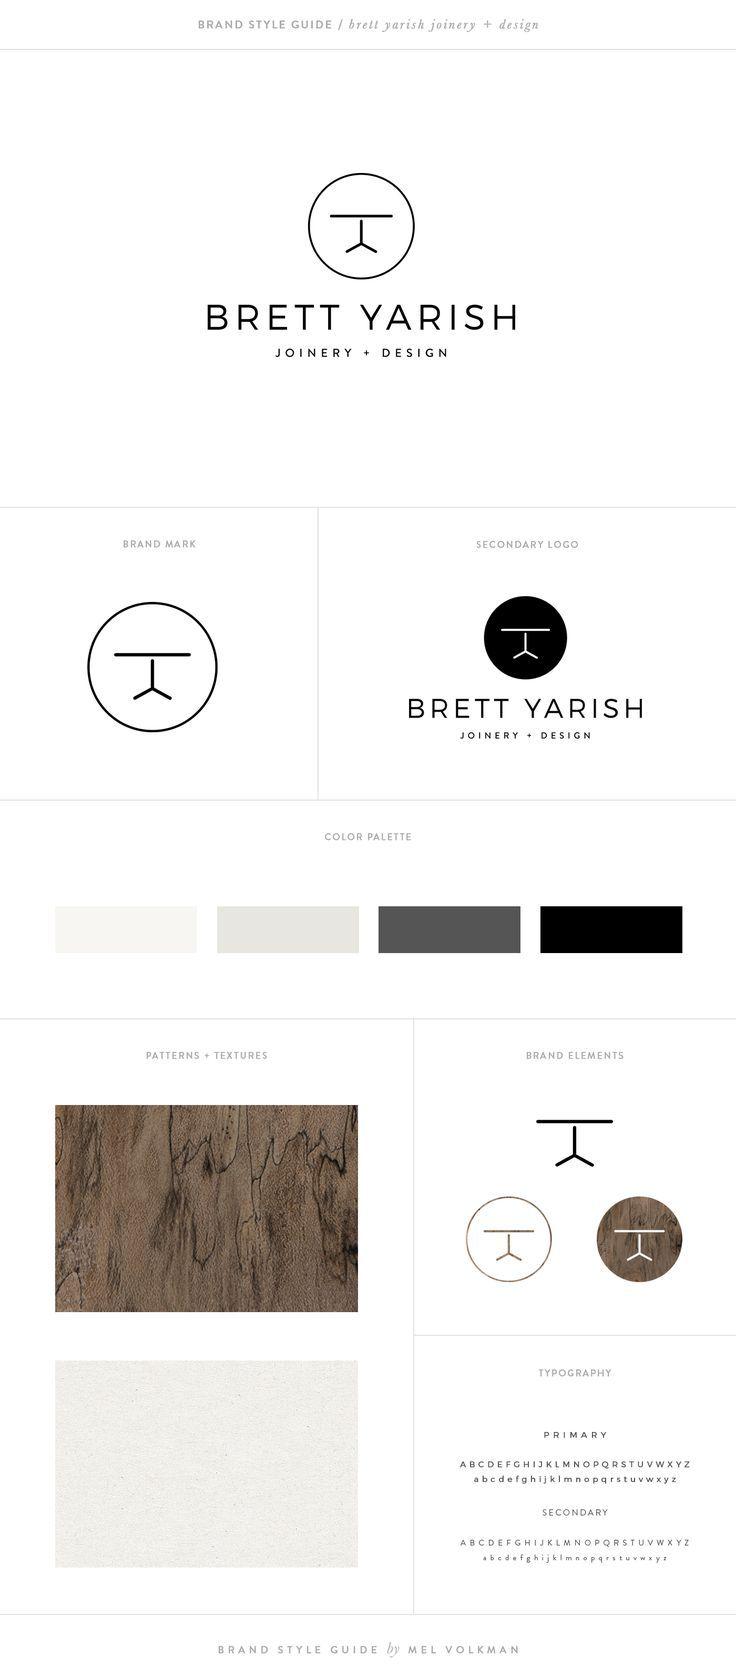 Brett Yarish Joinery + Design | Brand style guide, Modern logo and ...